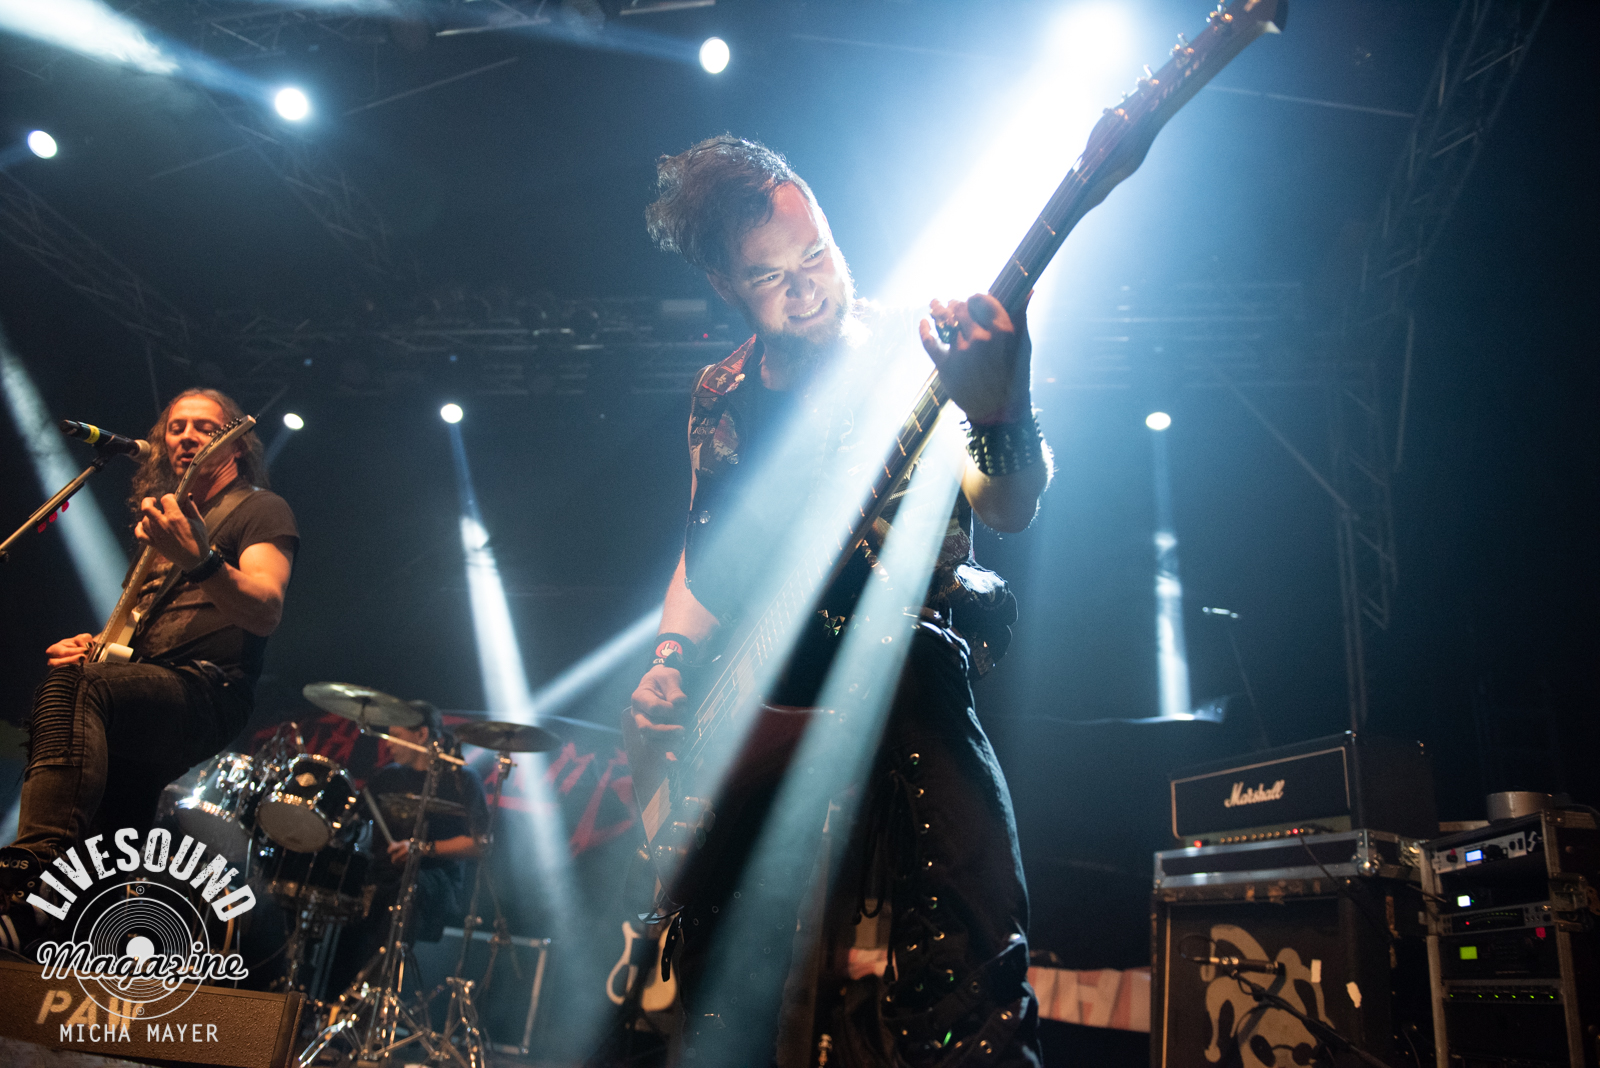 Livesound-Magazine | Teeth of Lamb @Rock in Peace Festival 2019